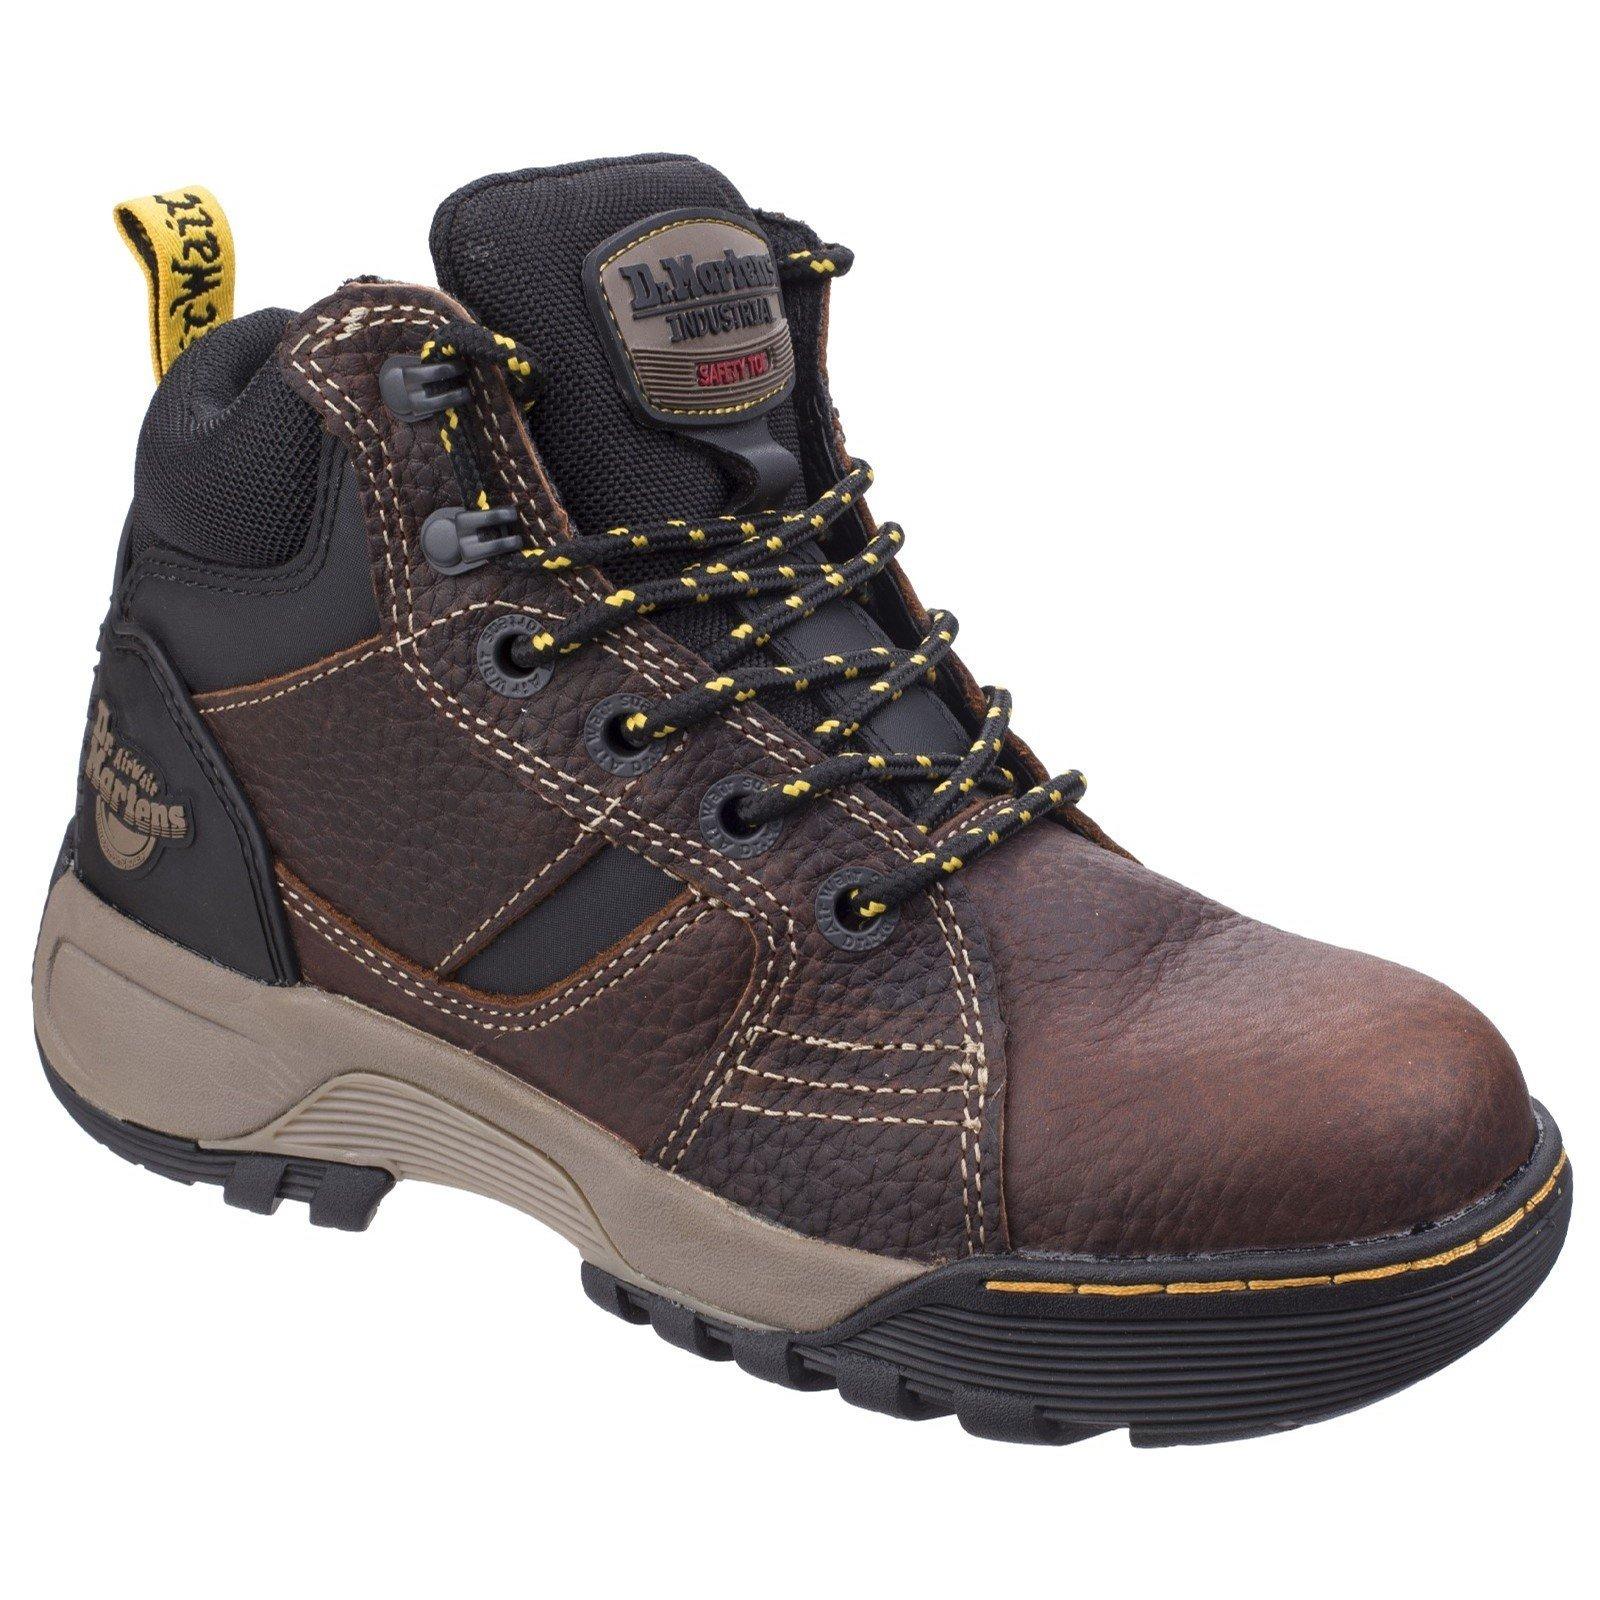 Dr Martens Men's Grapple Safety Boot Various Colours 26023 - Teak 13